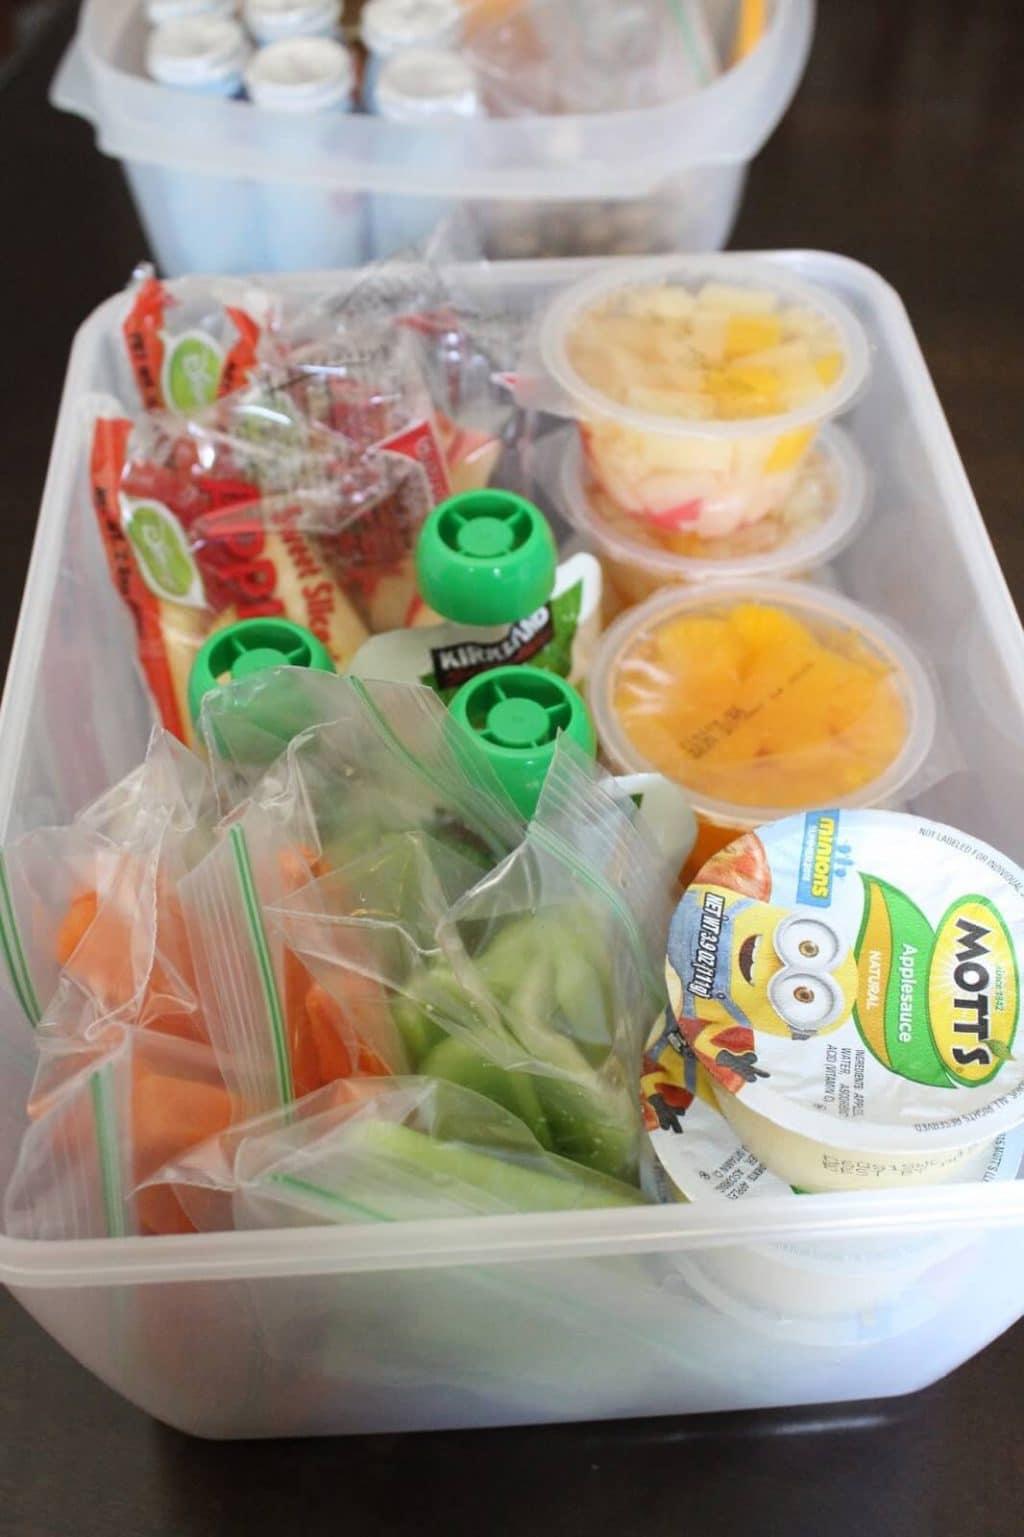 School Lunch fruit and veggies